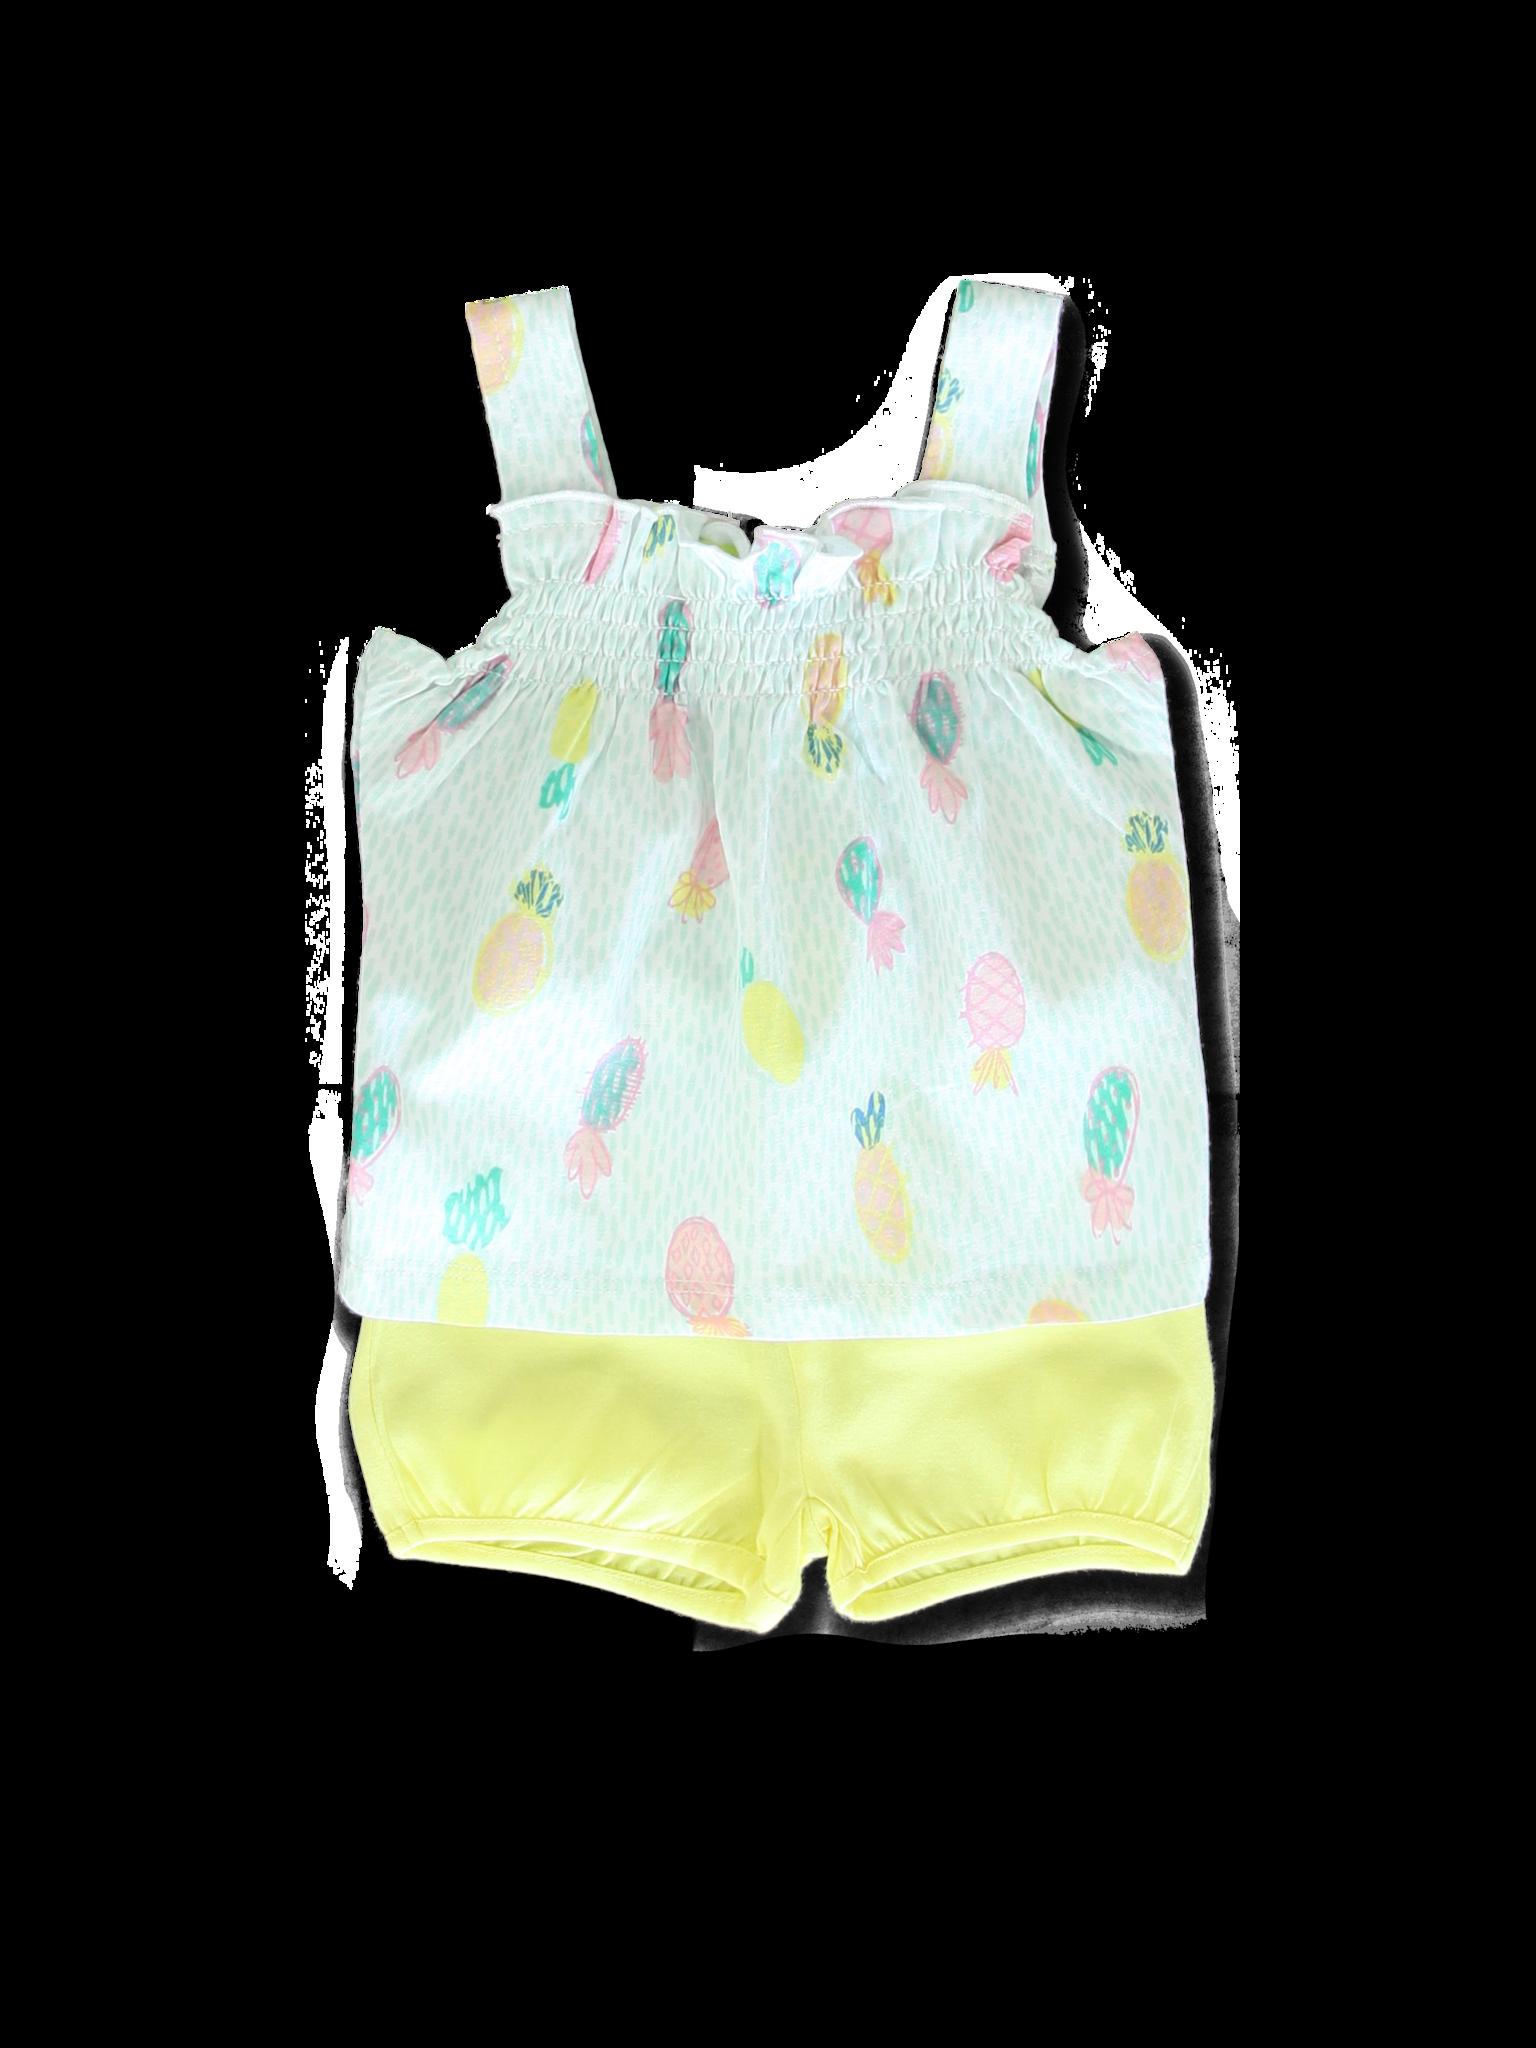 All Brands | Summerproducts Baby | Set | 8 pcs/box